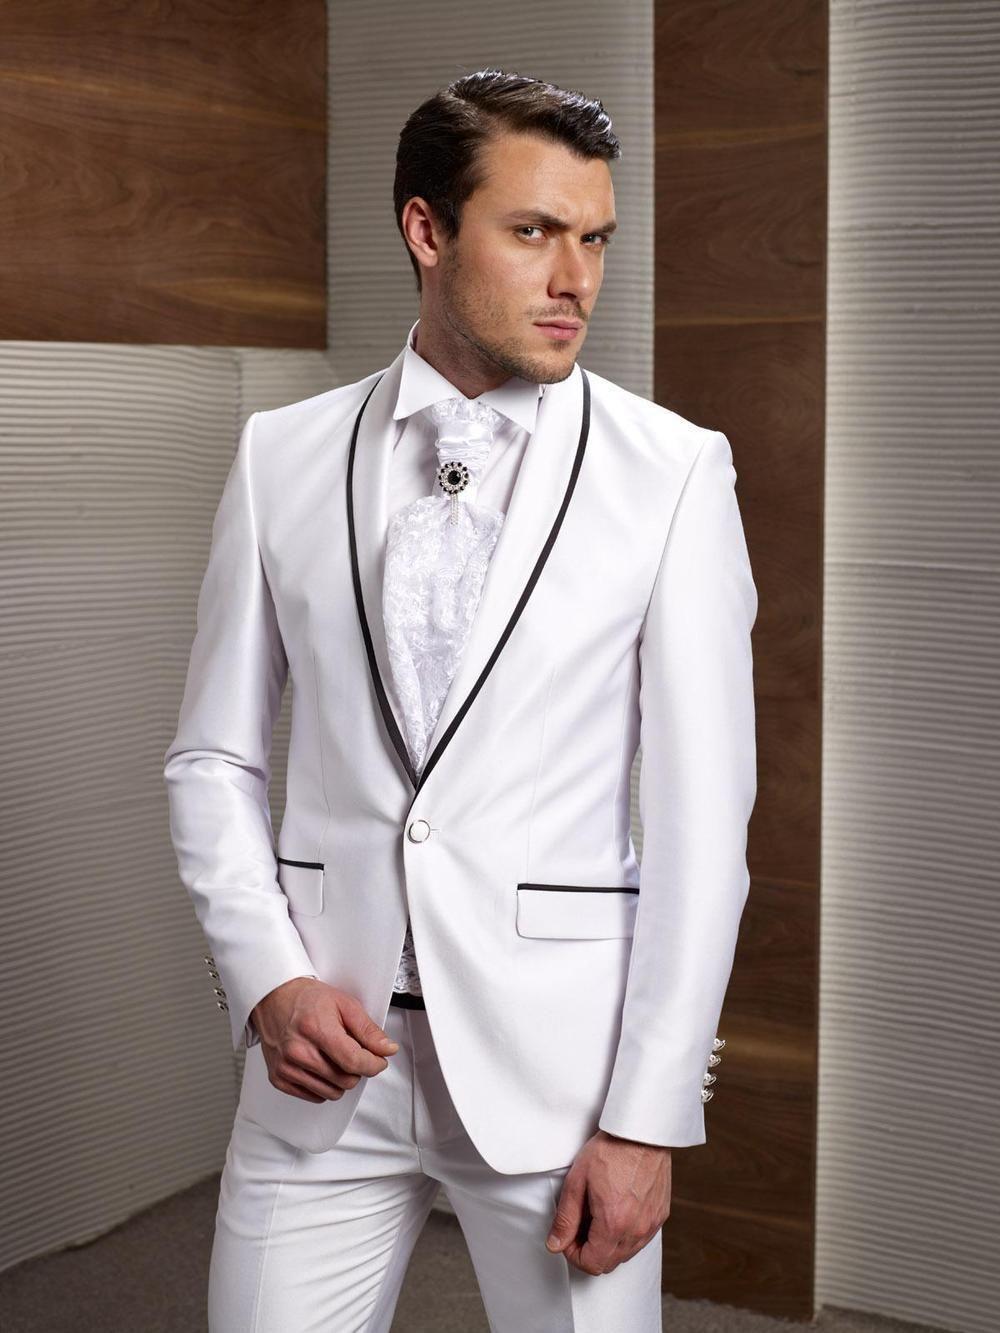 terno de casamento branco - Pesquisa Google | Mr. | Pinterest | Men ...